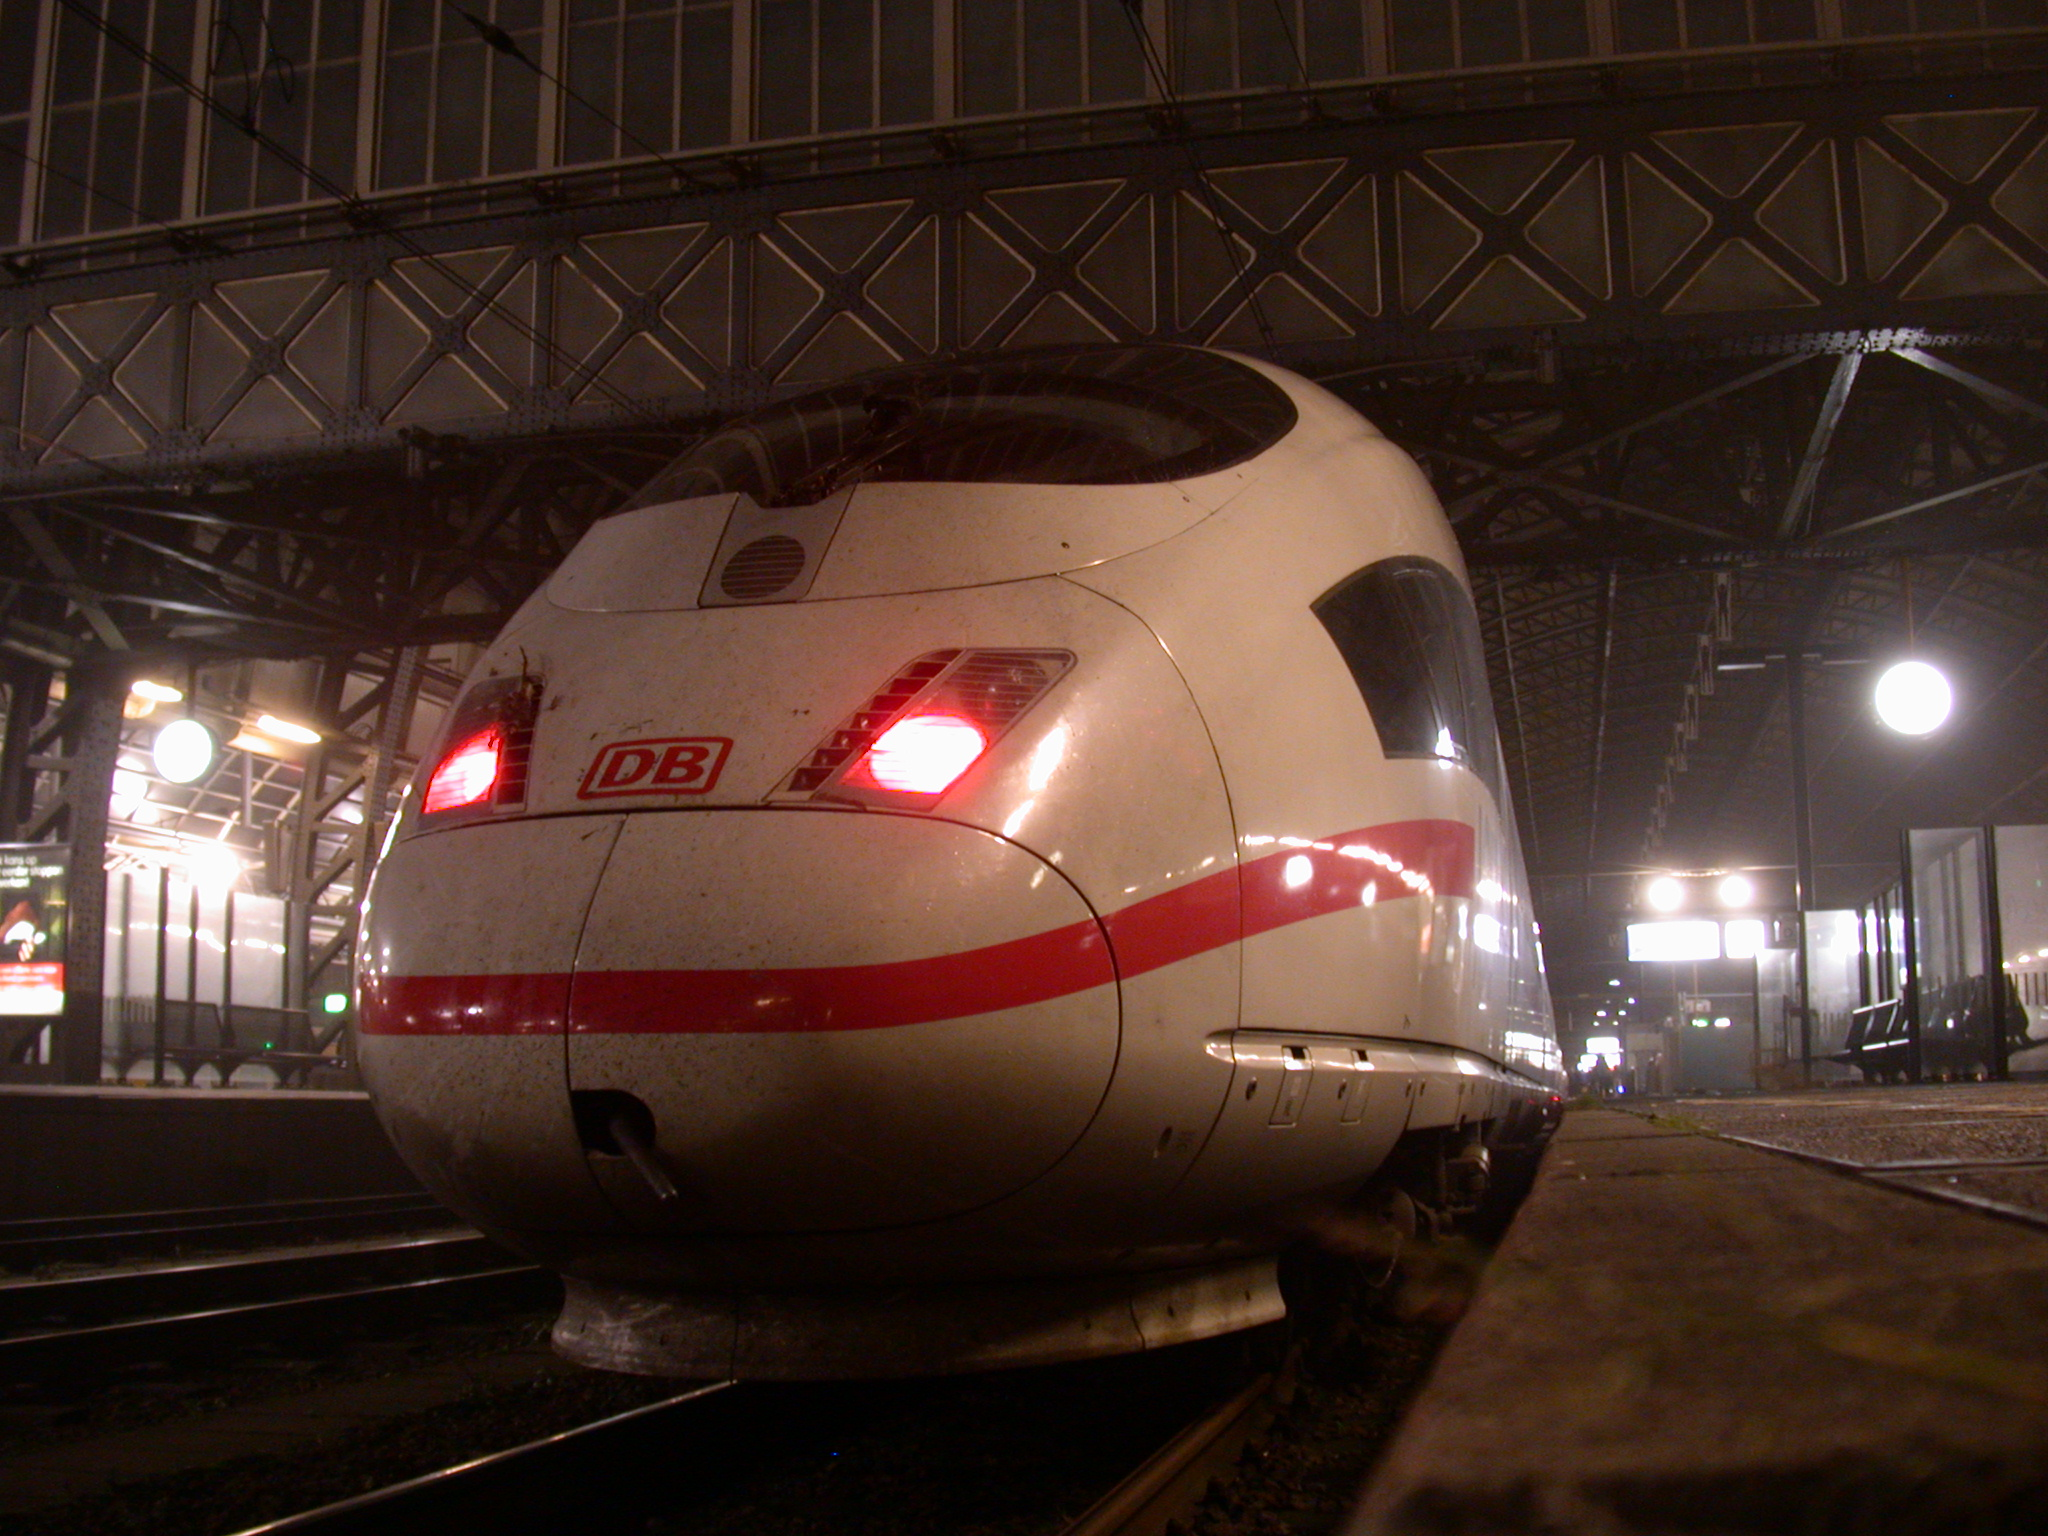 train station cockpit high speed highspeed fast tgv white red stripe headlights textures